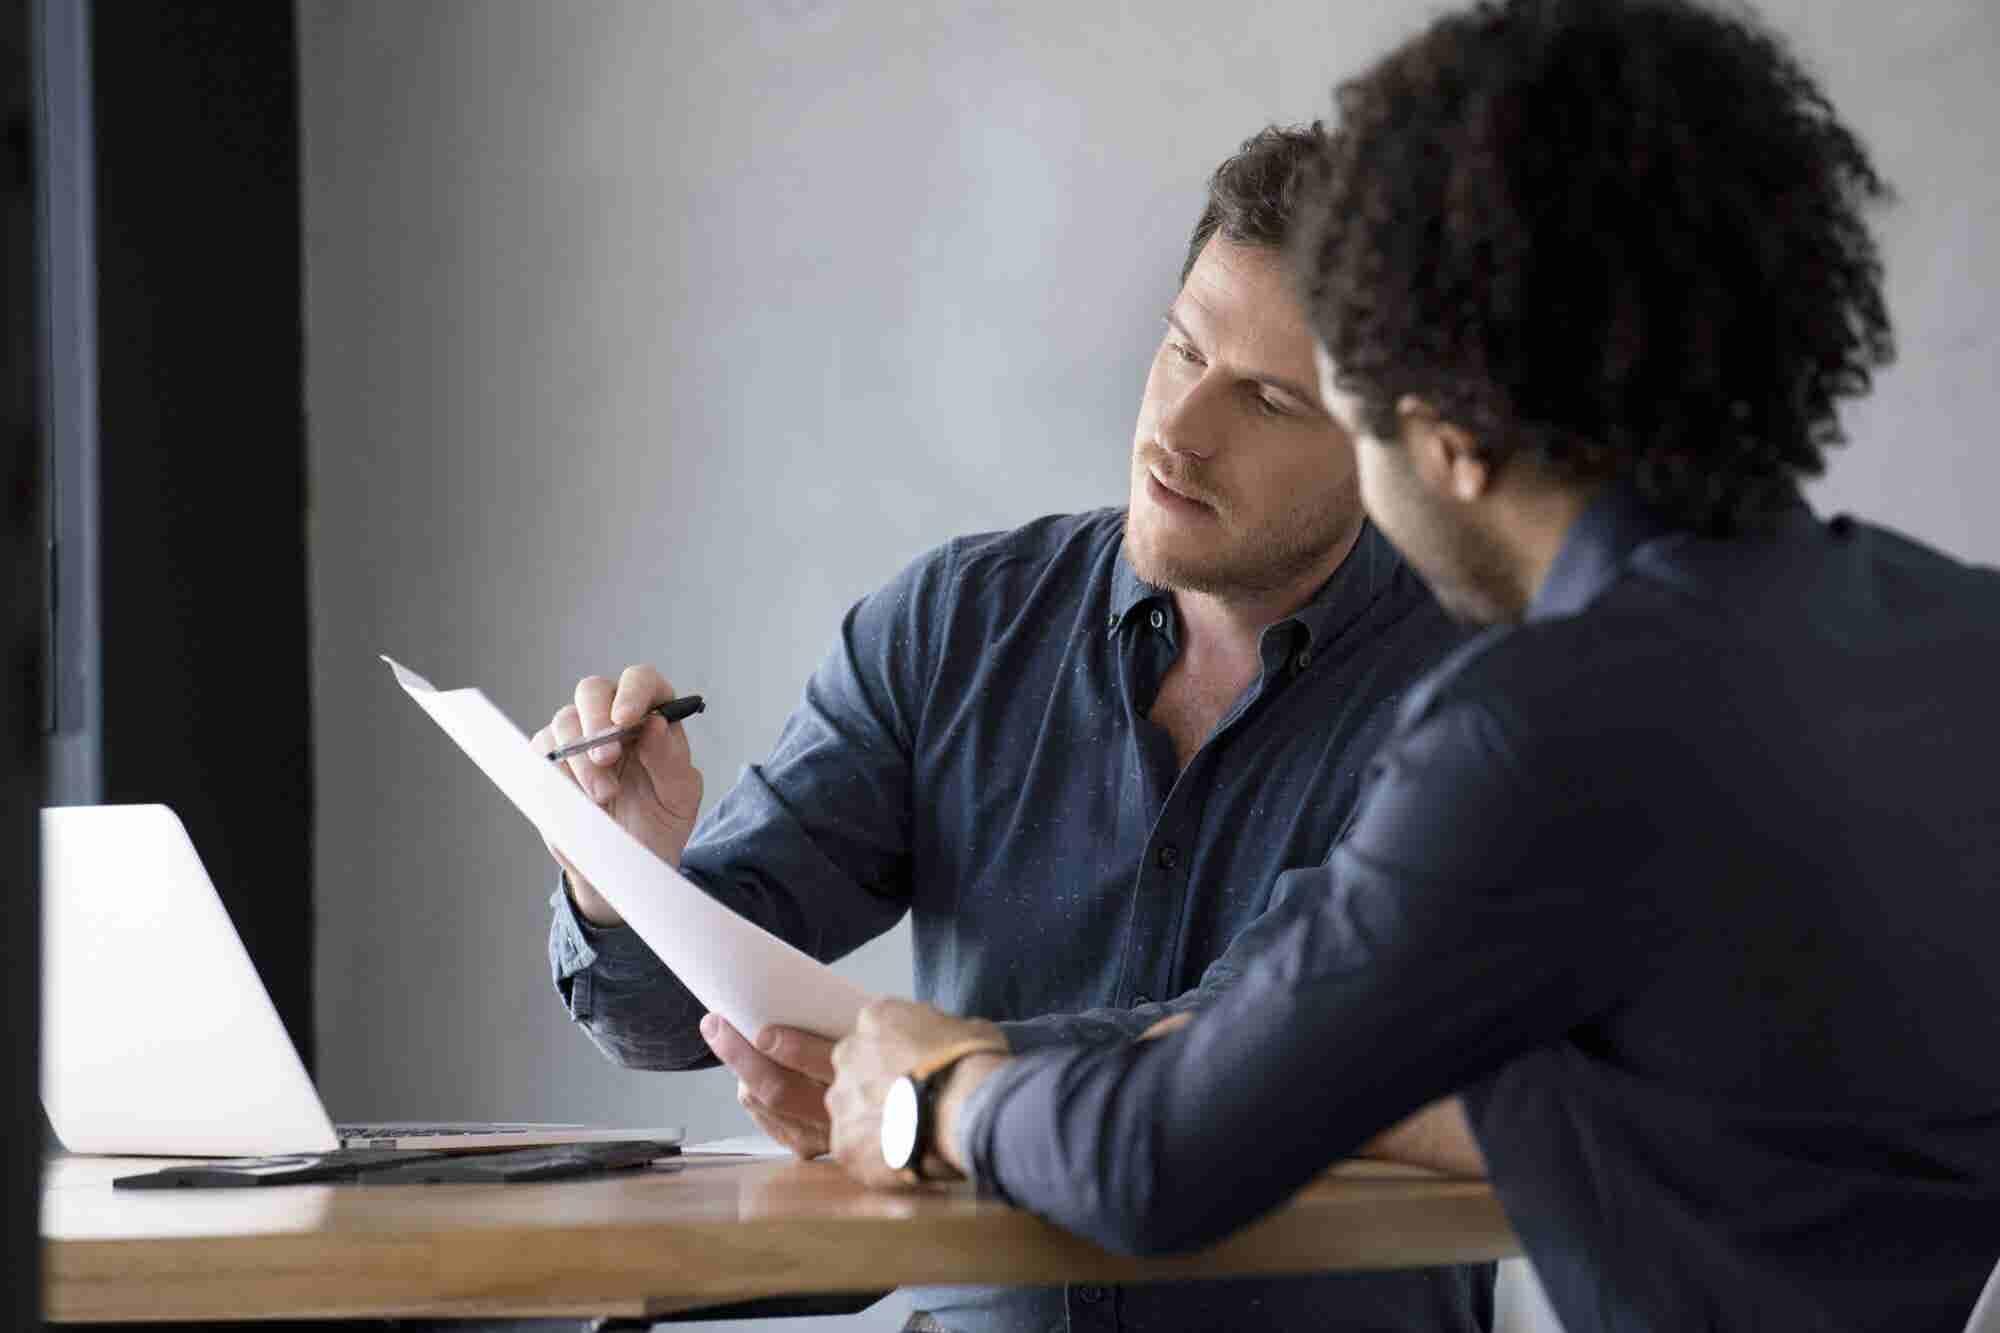 3 Ways to Encourage Your Staff to Think Like Entrepreneurs